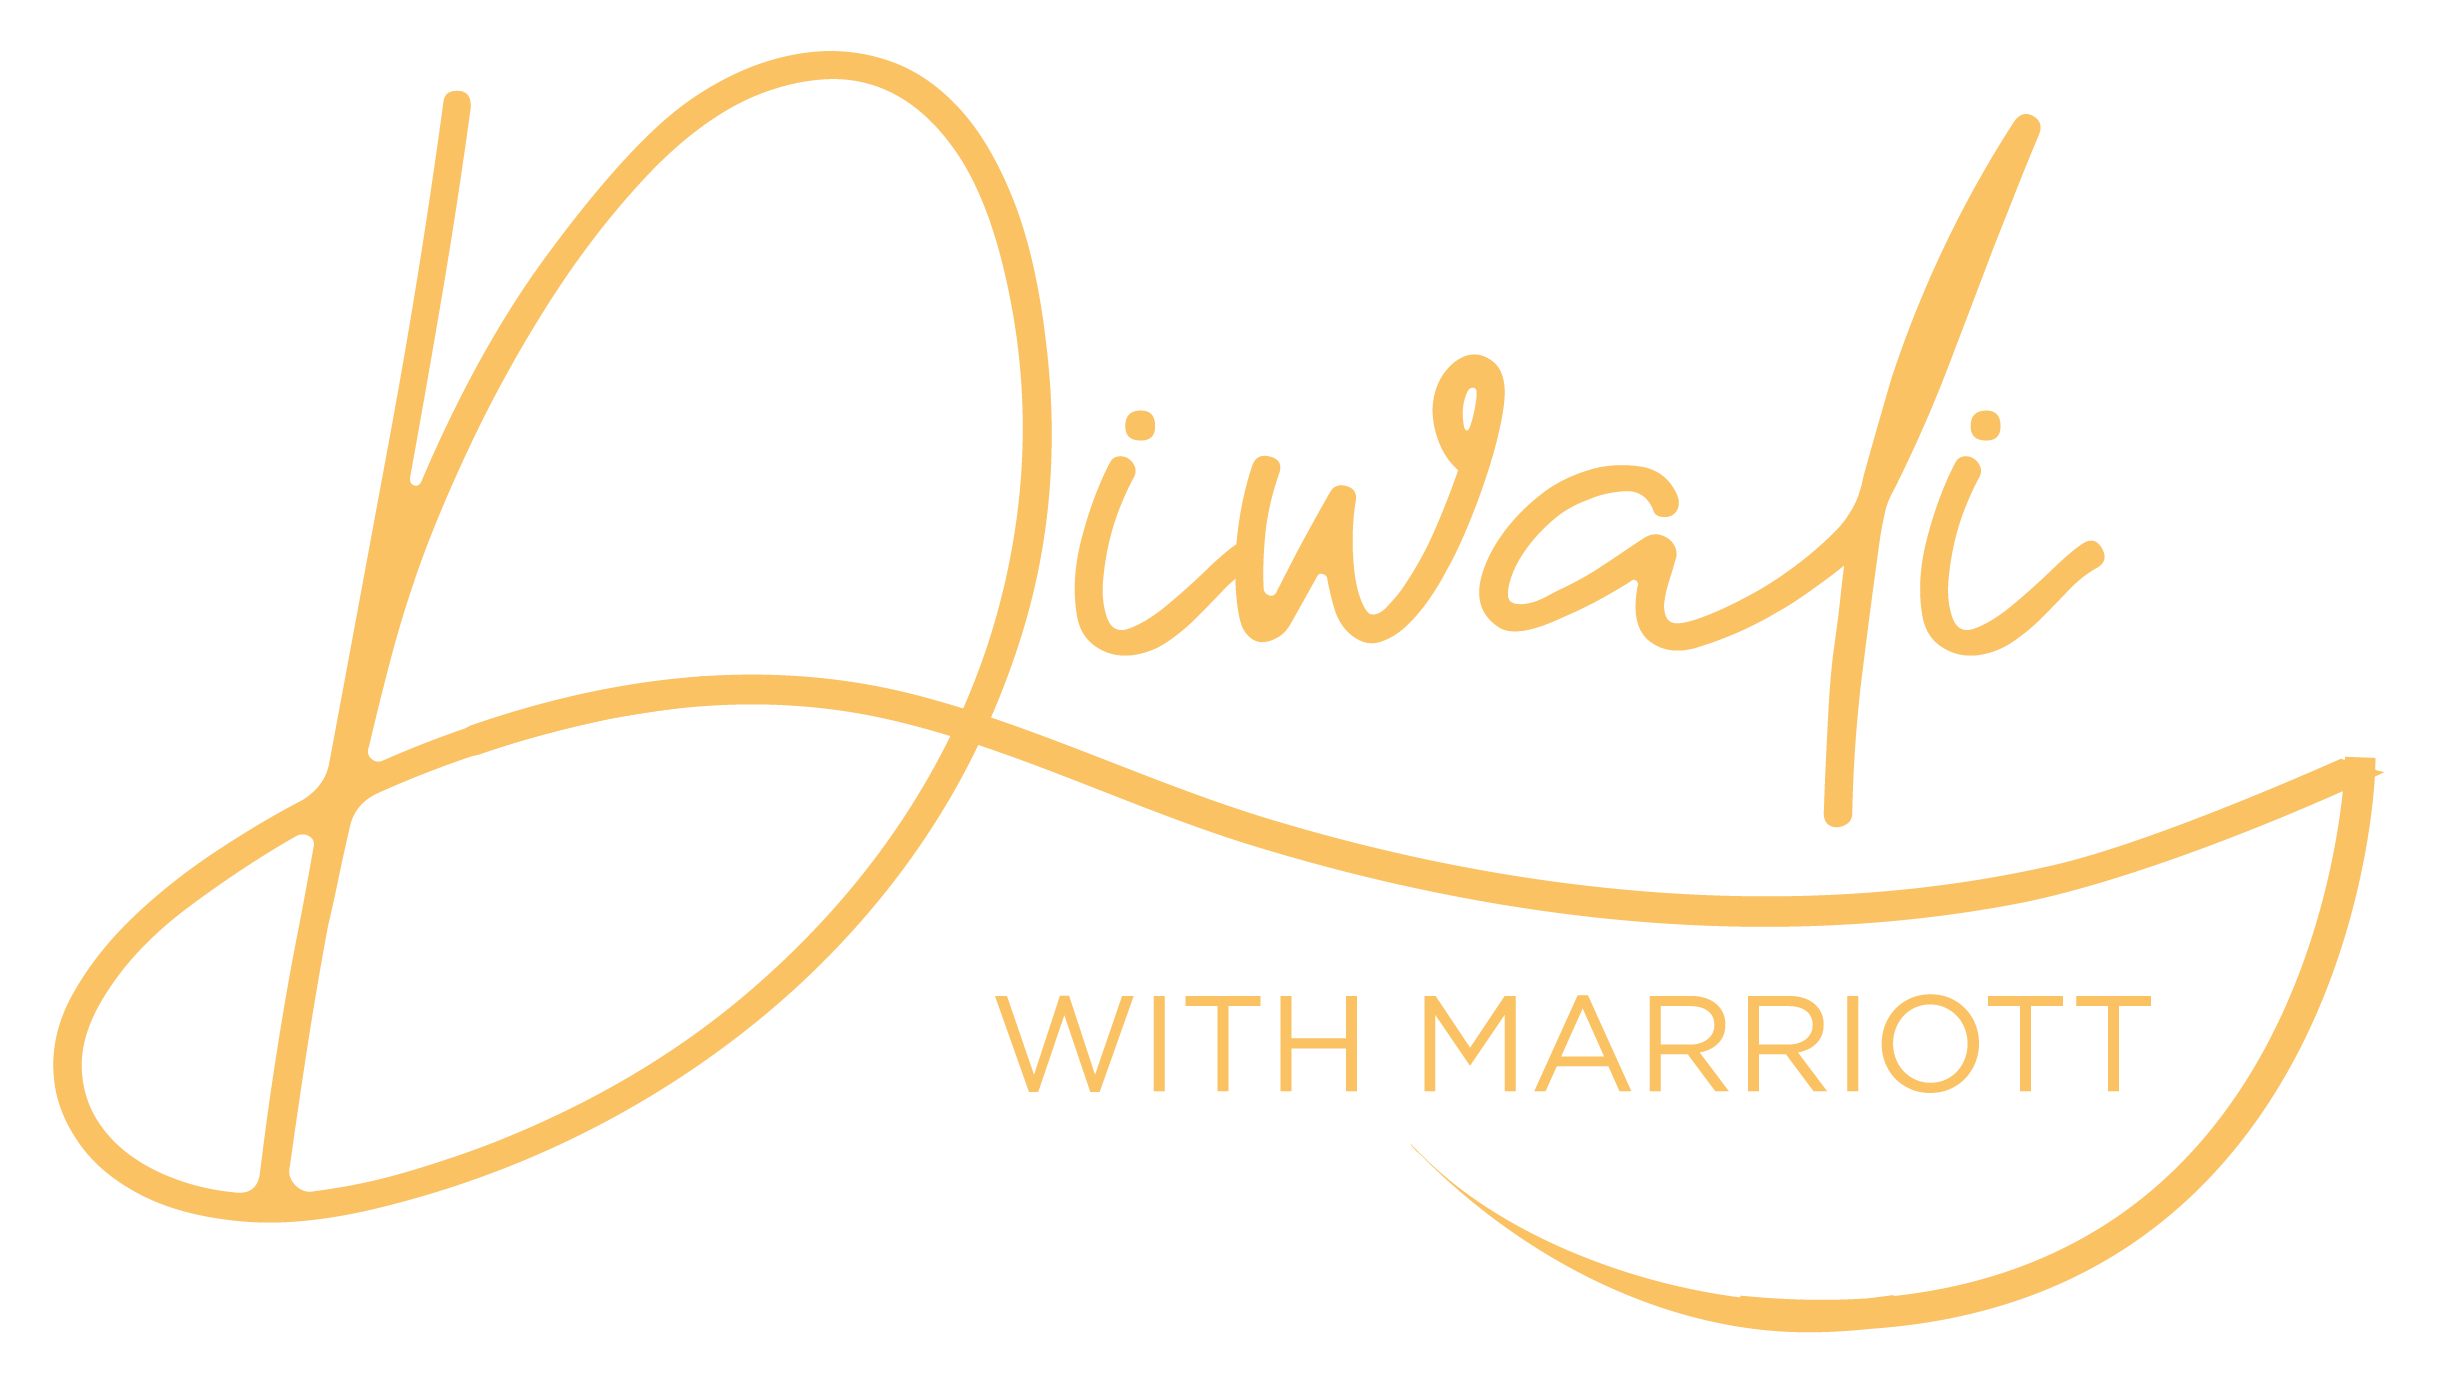 Diwali with Marriott Logo